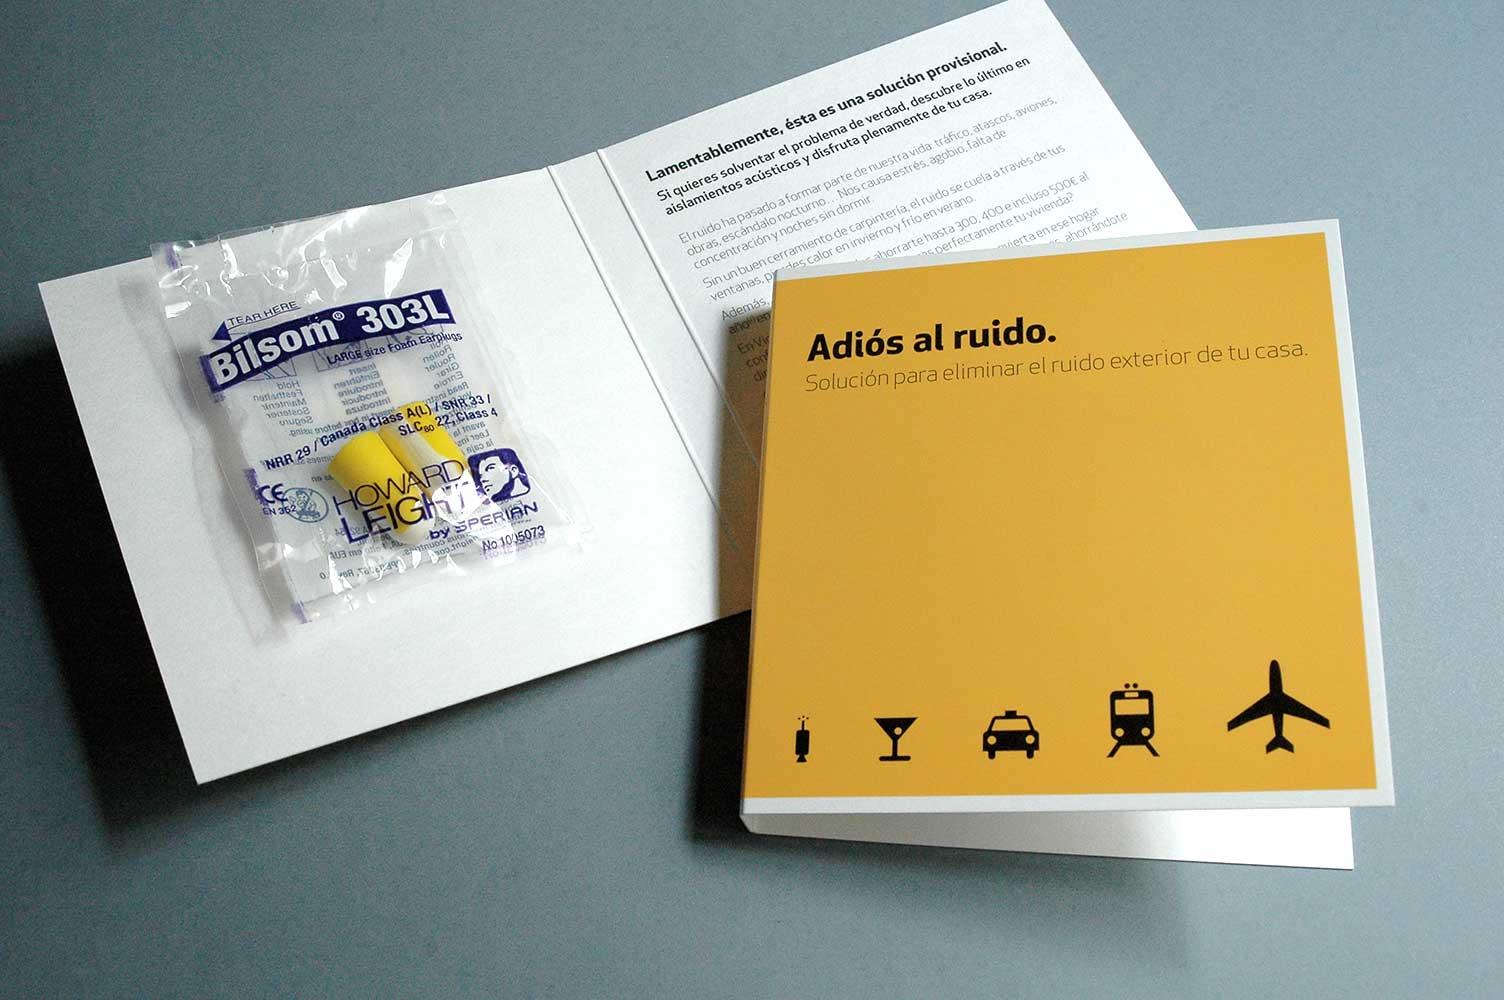 Envío publicitario aislamiento en zonas de contaminación acústica Vicent Torres